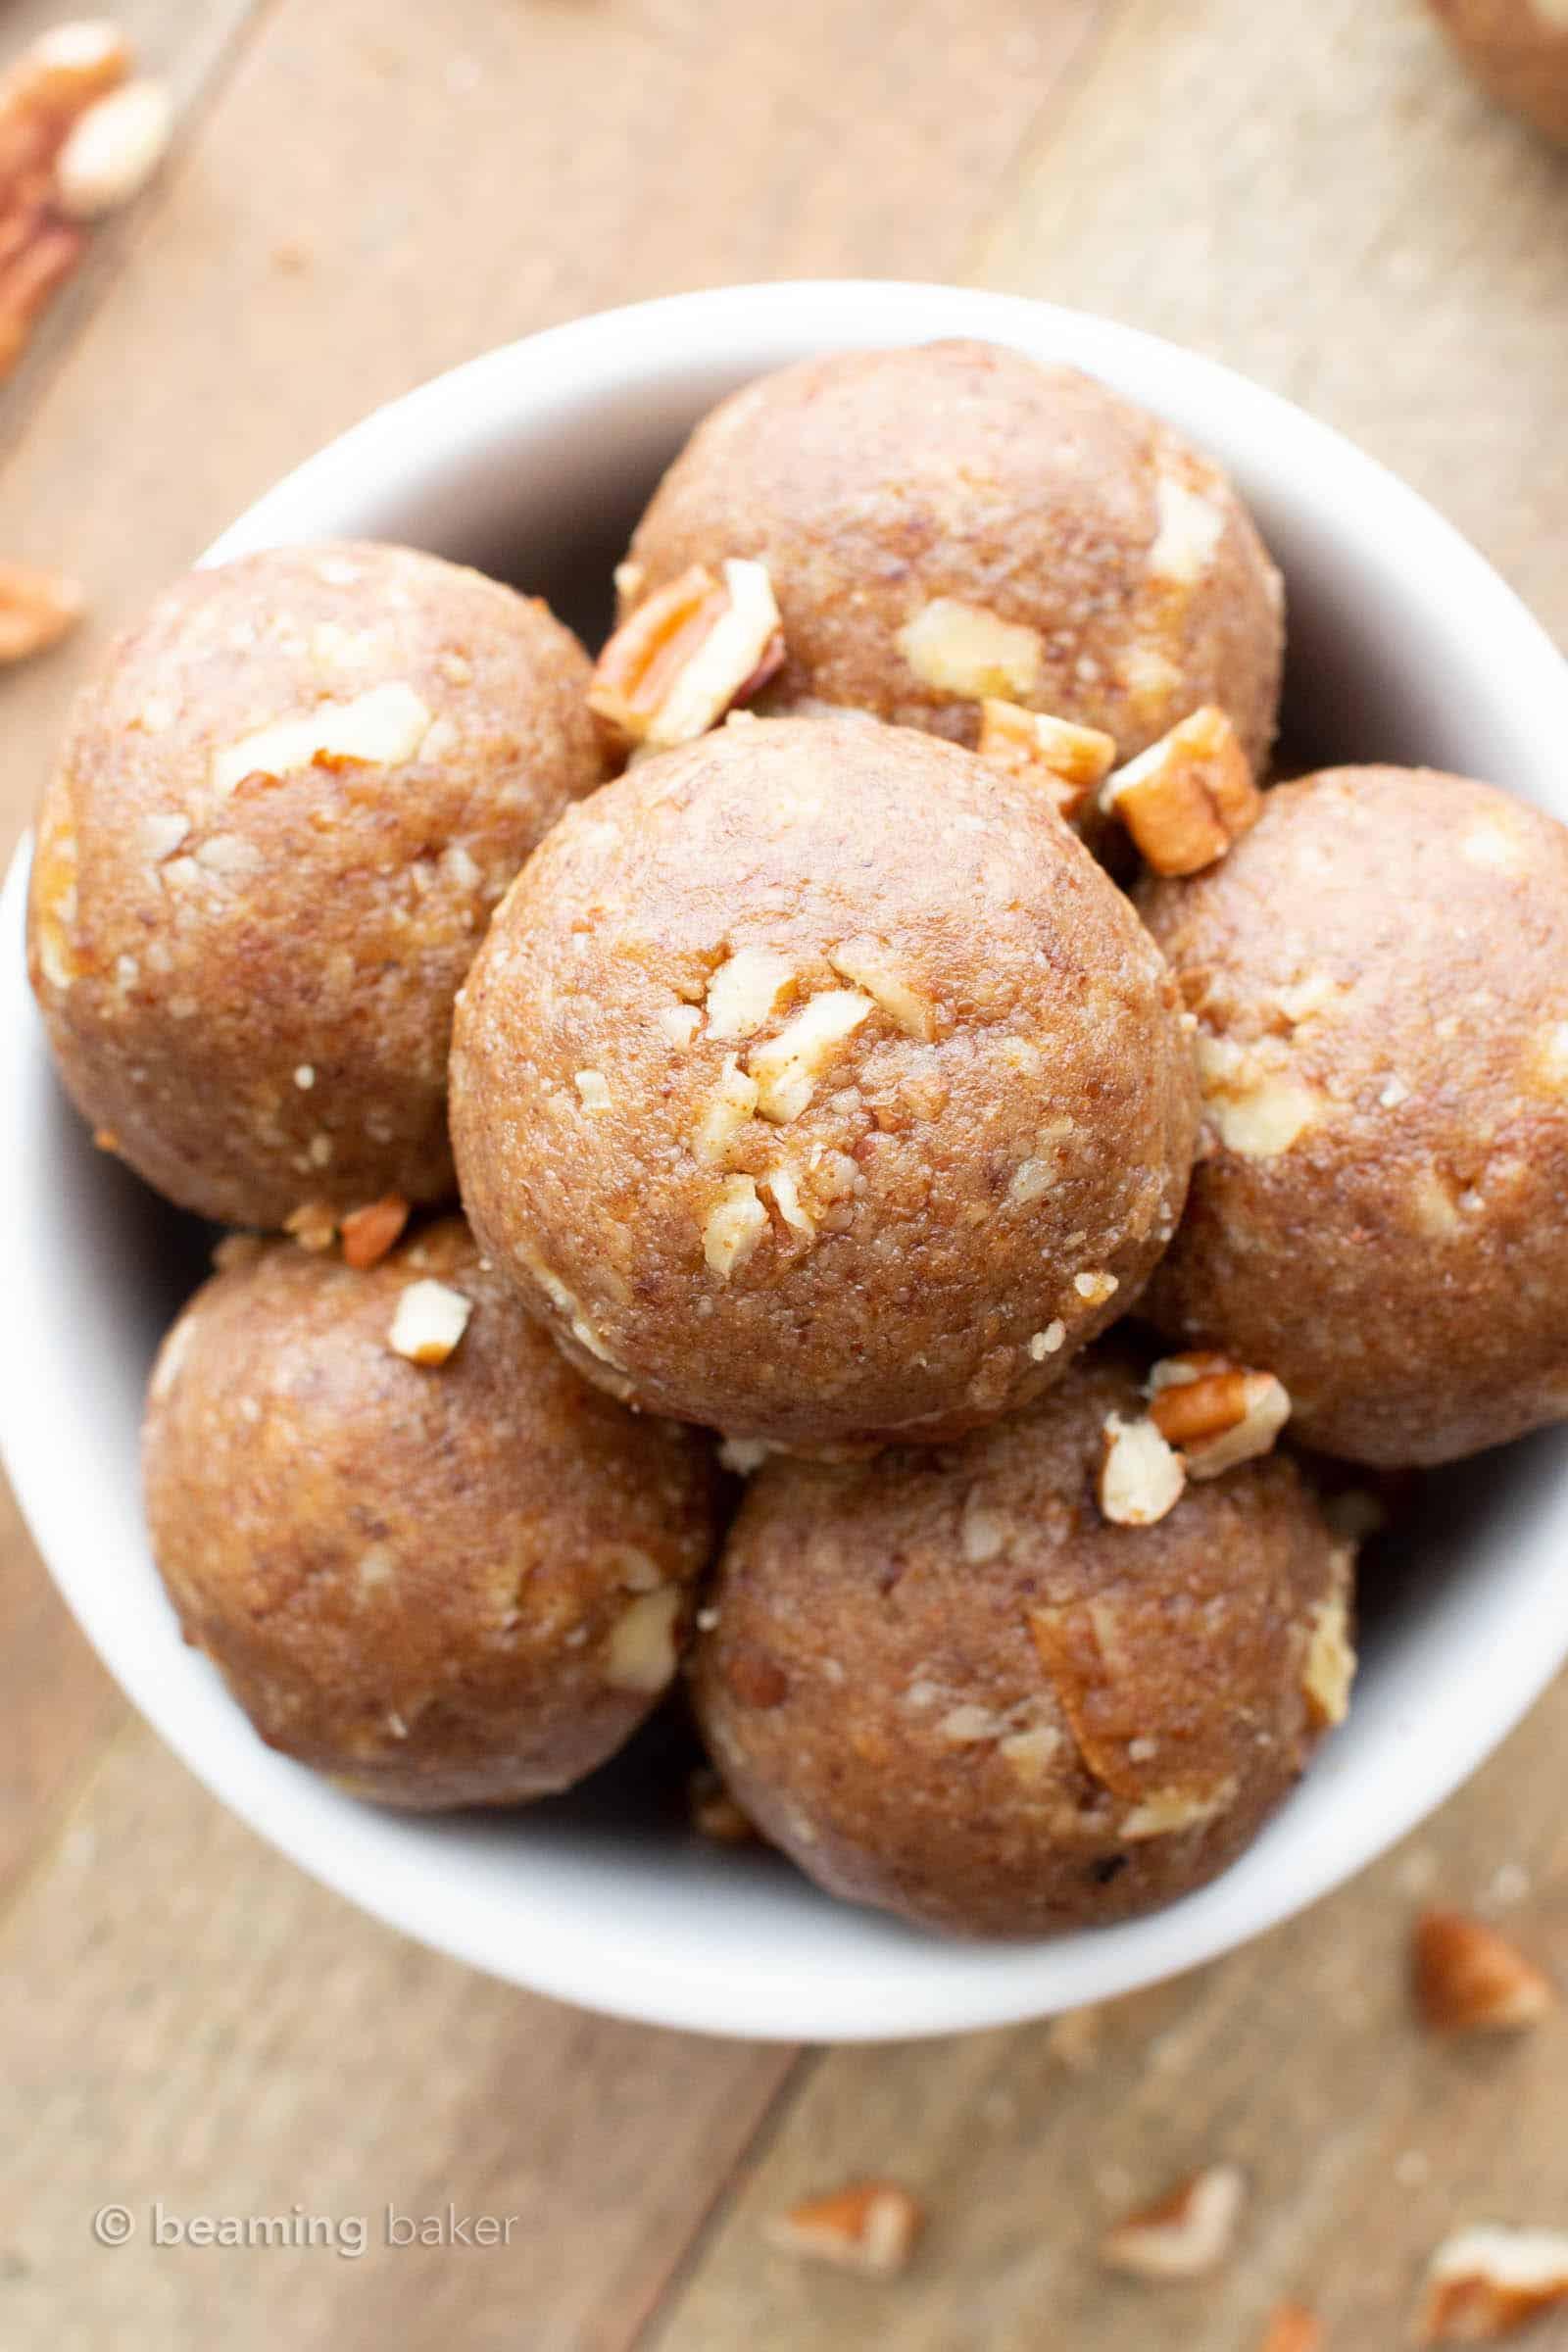 Vegan Energy Balls: just 3 ingredients for easy vegan energy balls that are soft, satisfying and delicious. Made with healthy, simple ingredients. #Vegan #EnergyBalls #NoBake #EnergyBites   Recipe at BeamingBaker.com